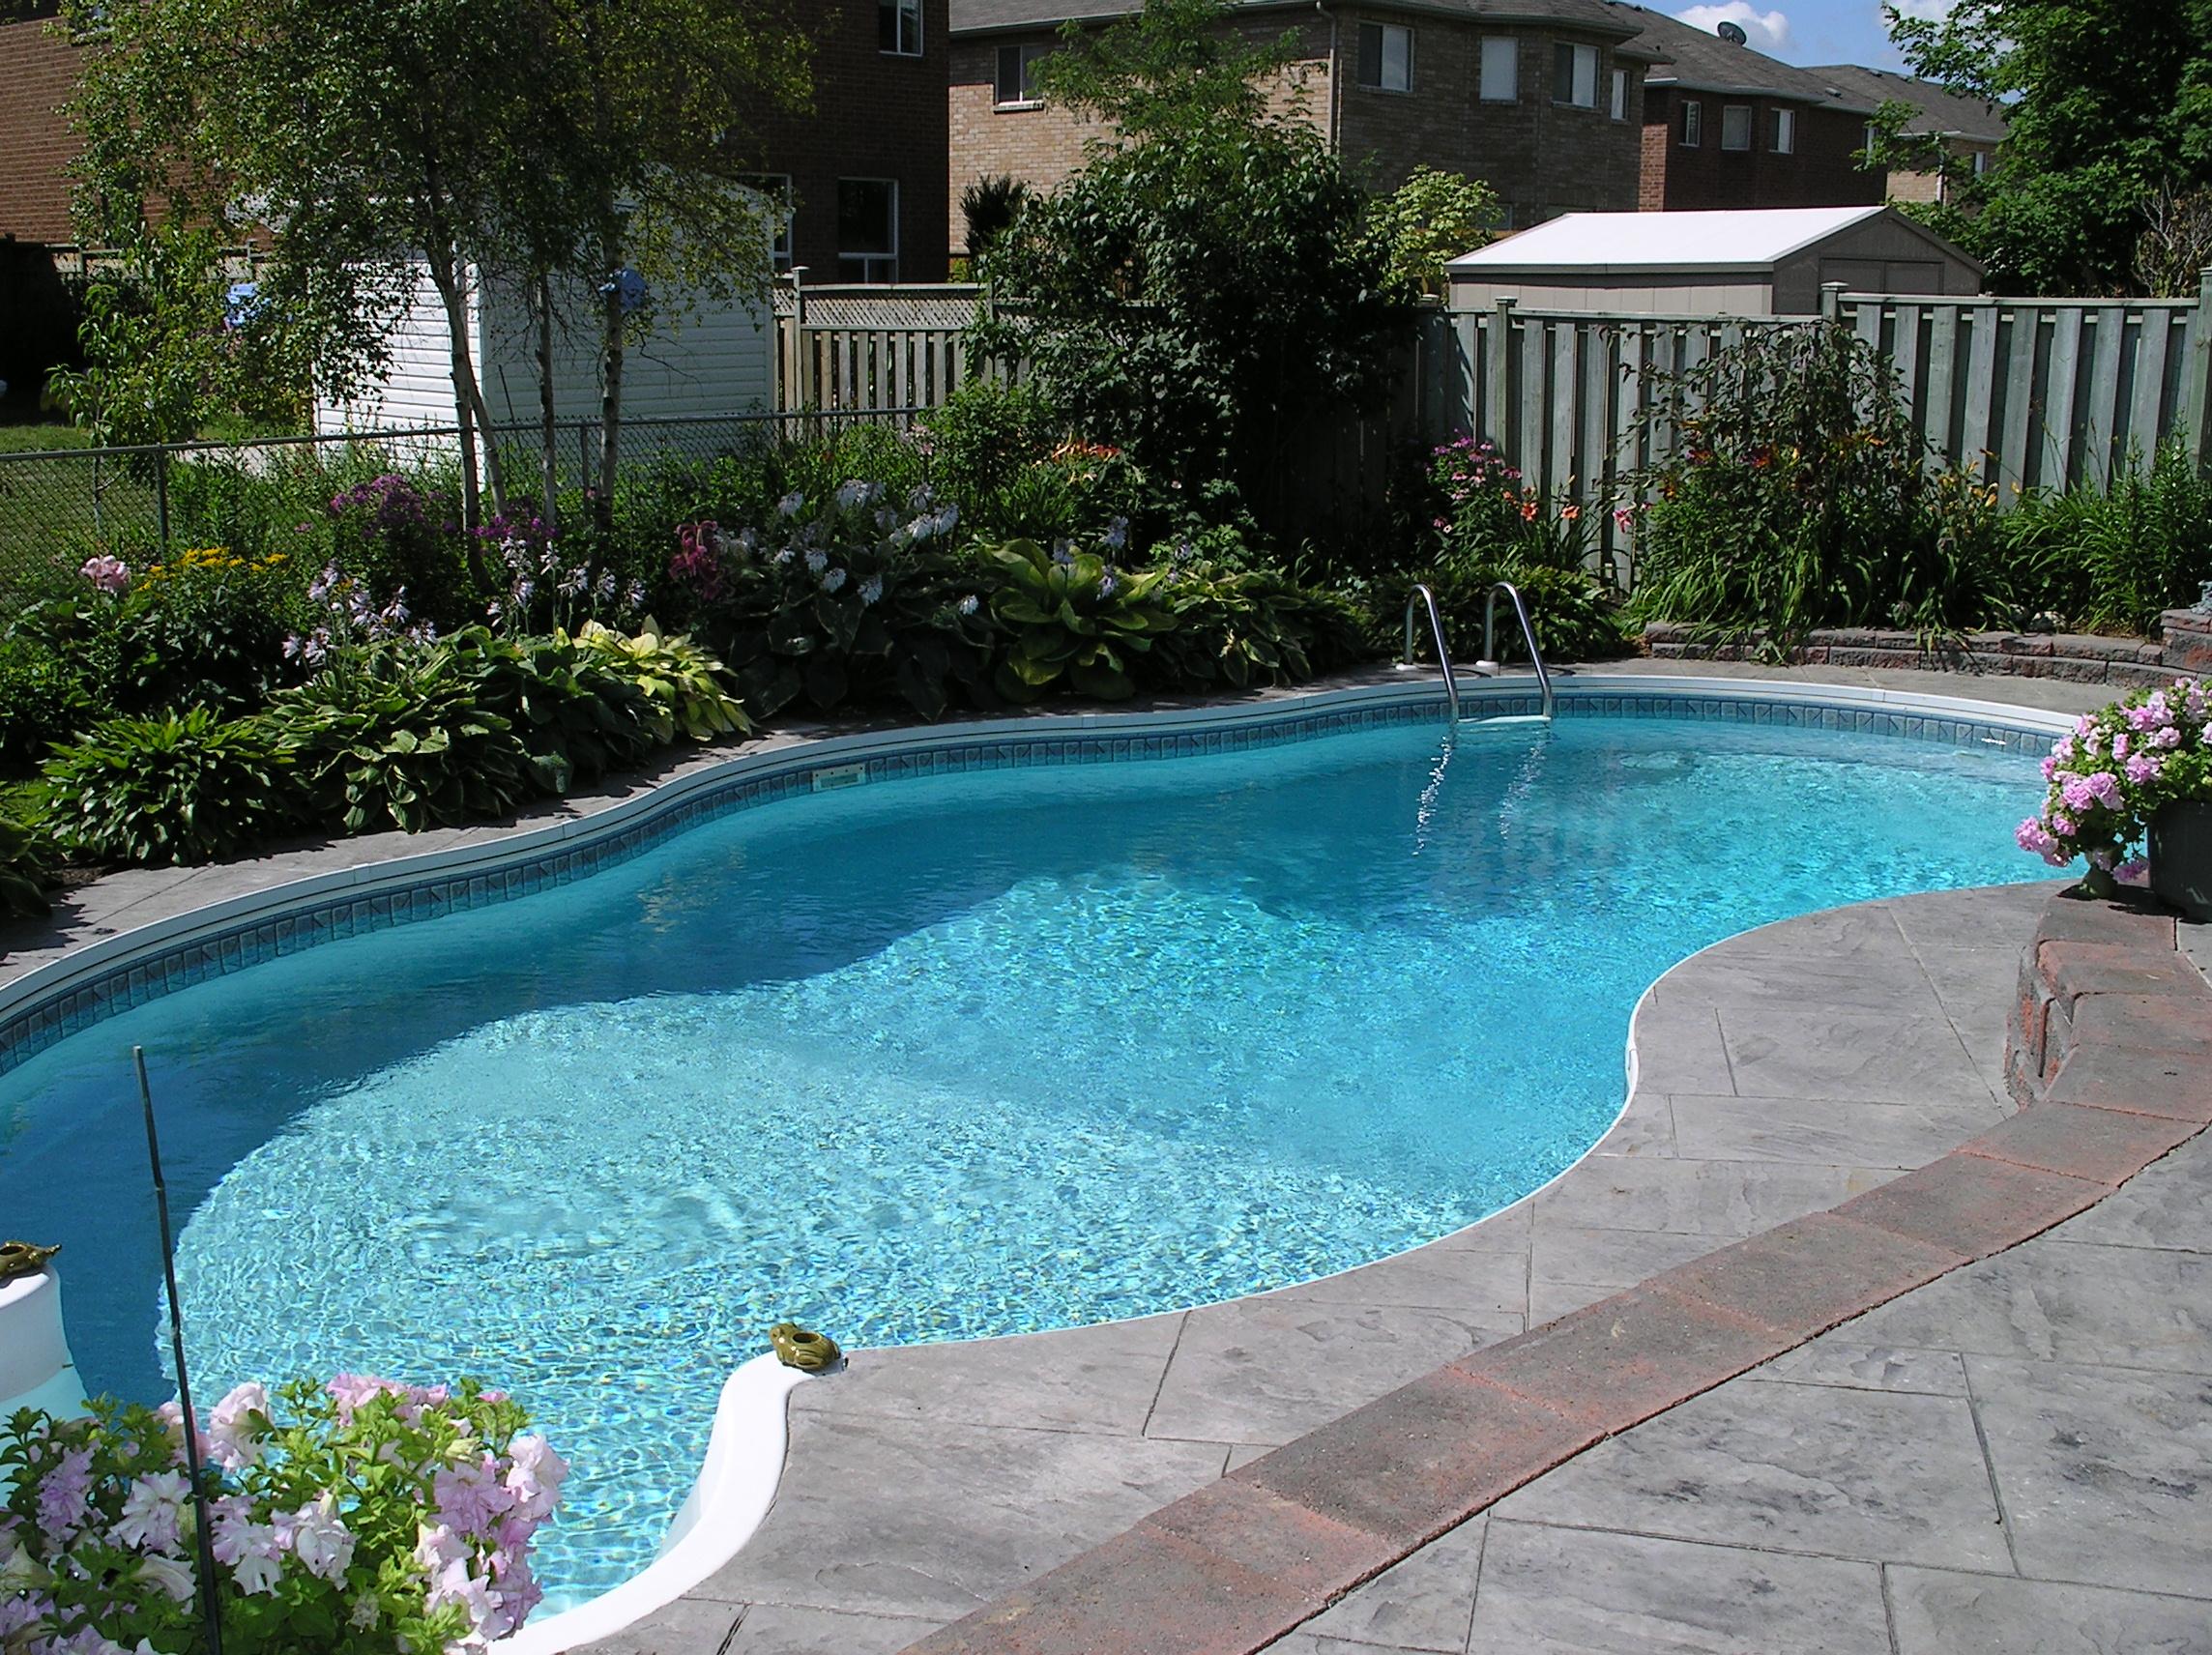 Concrete vs Fiberglass Pools: Which is Better